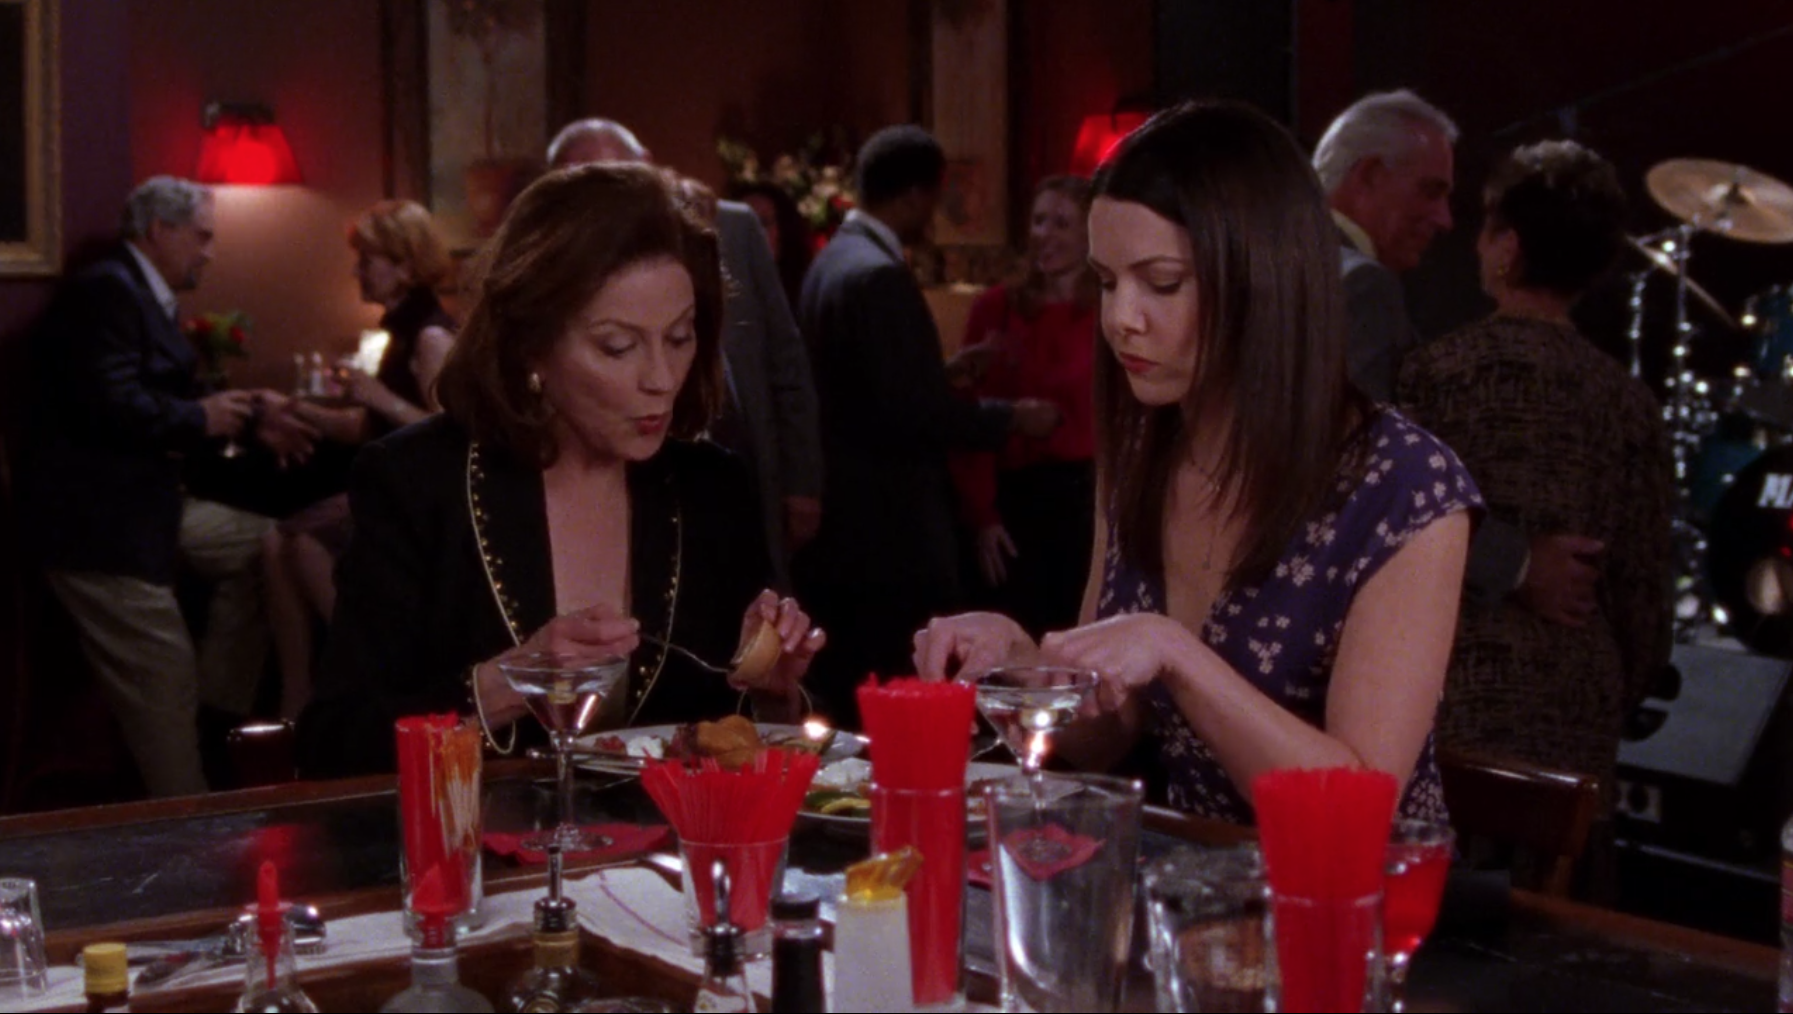 Lorelai and Emily having dinner at the bar